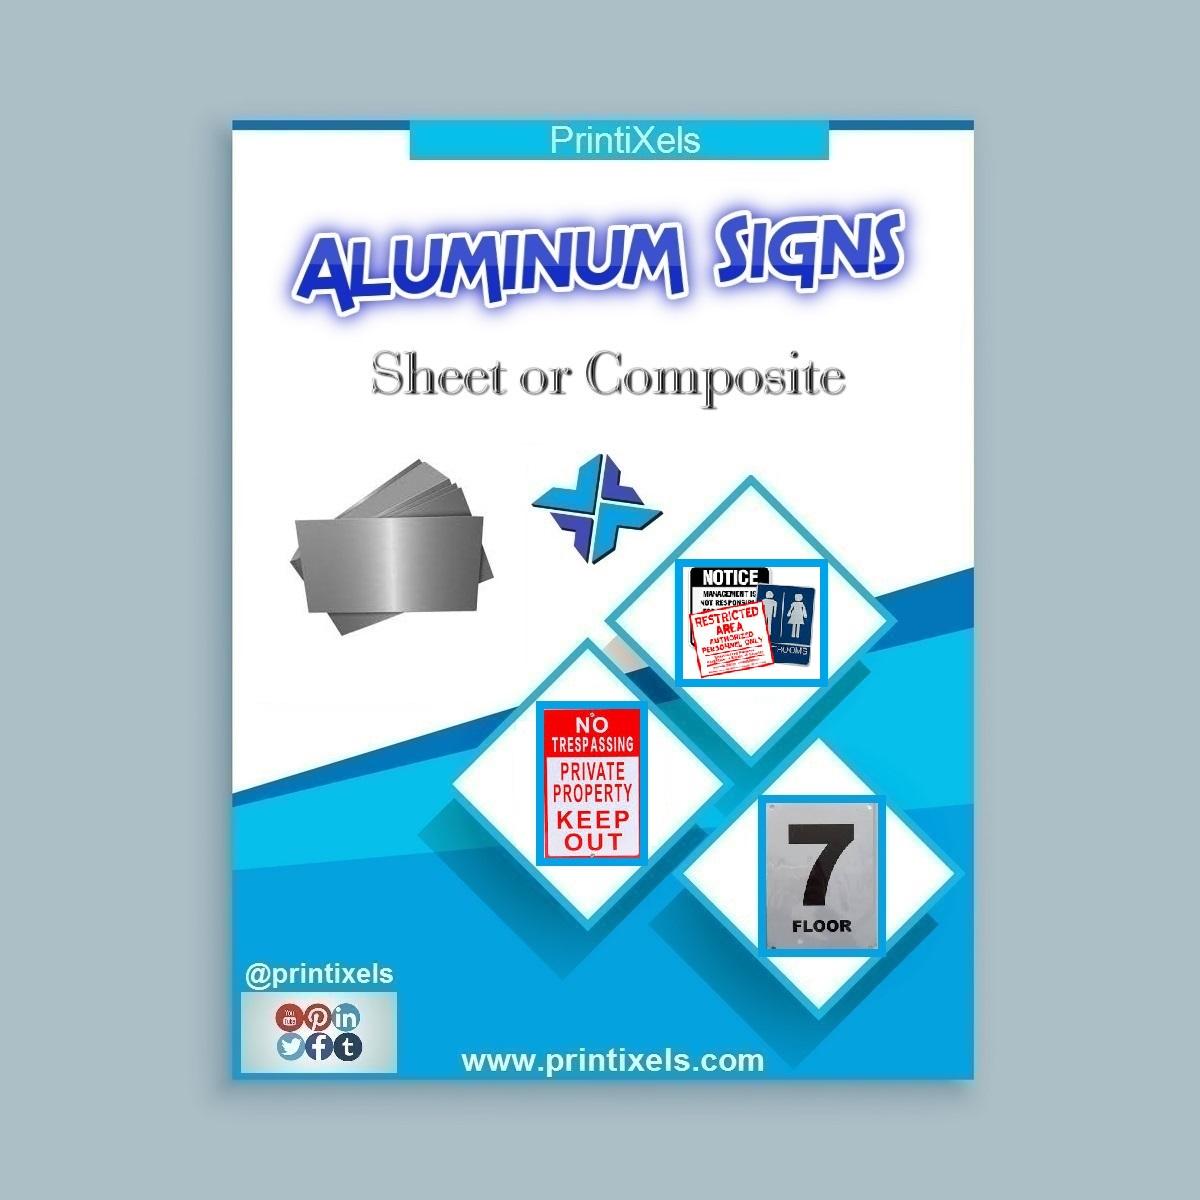 Custom Aluminum Signs: Sheet or Composite